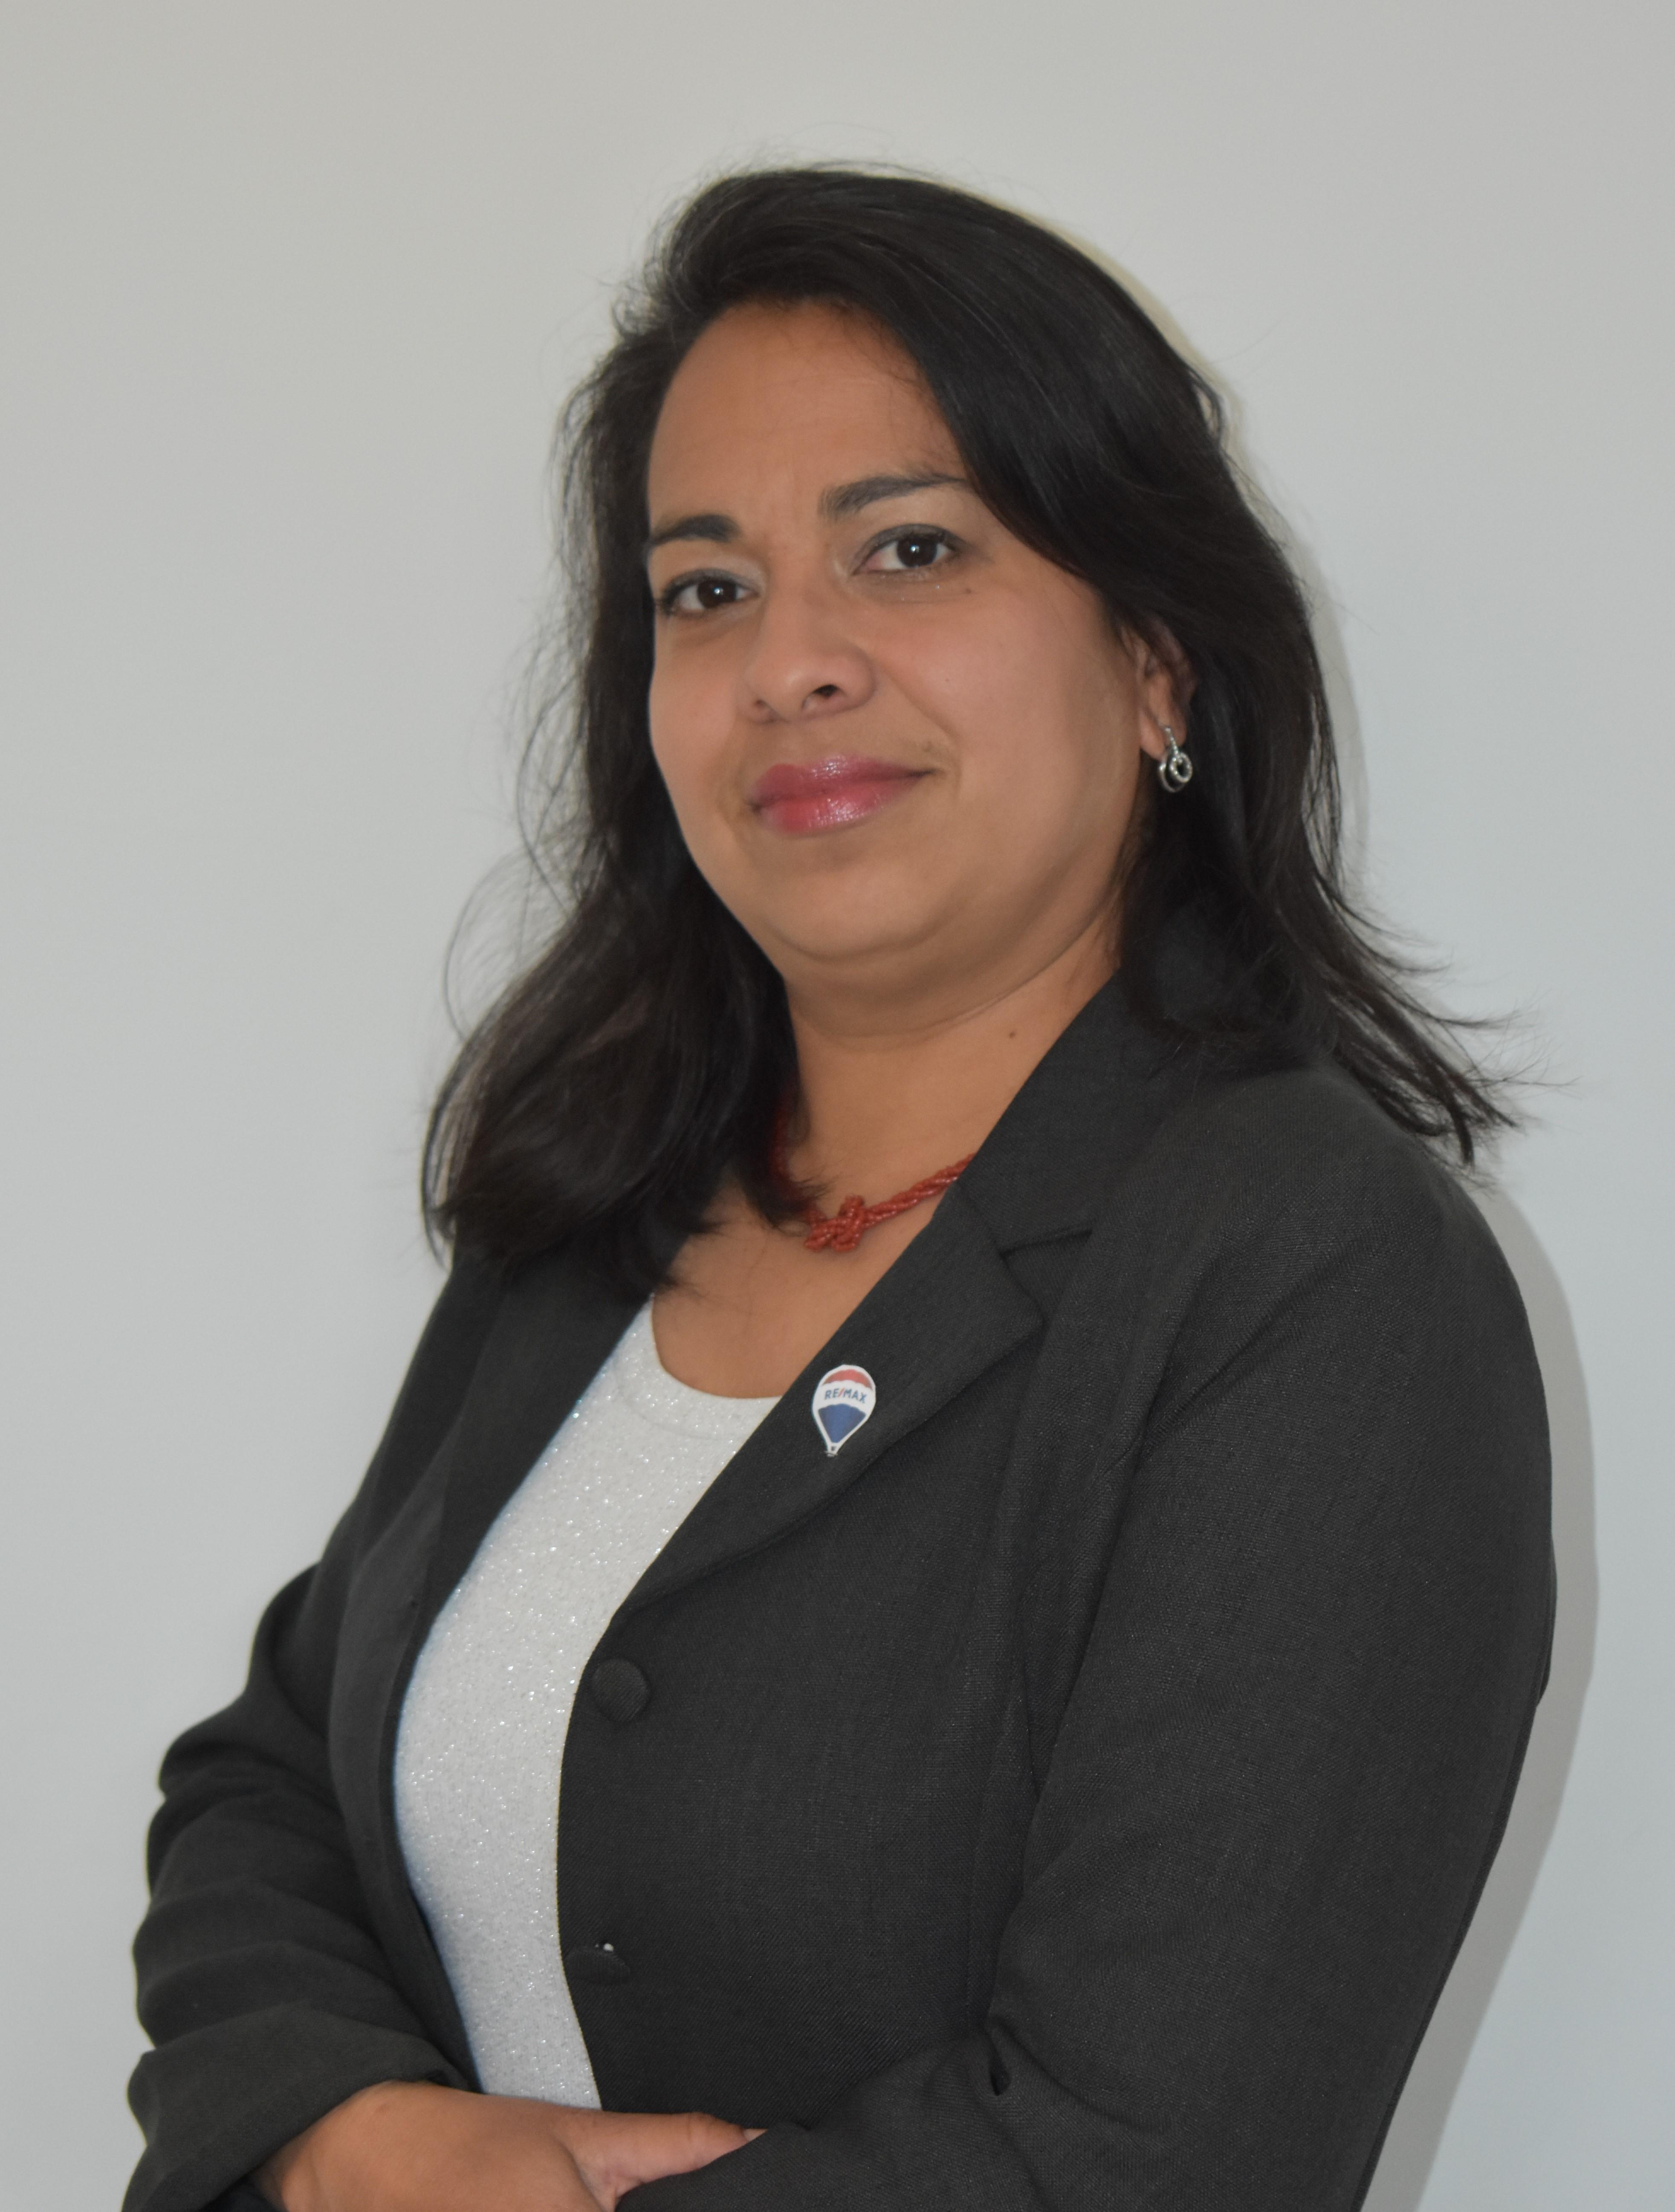 Pilar  Padilla Peralta